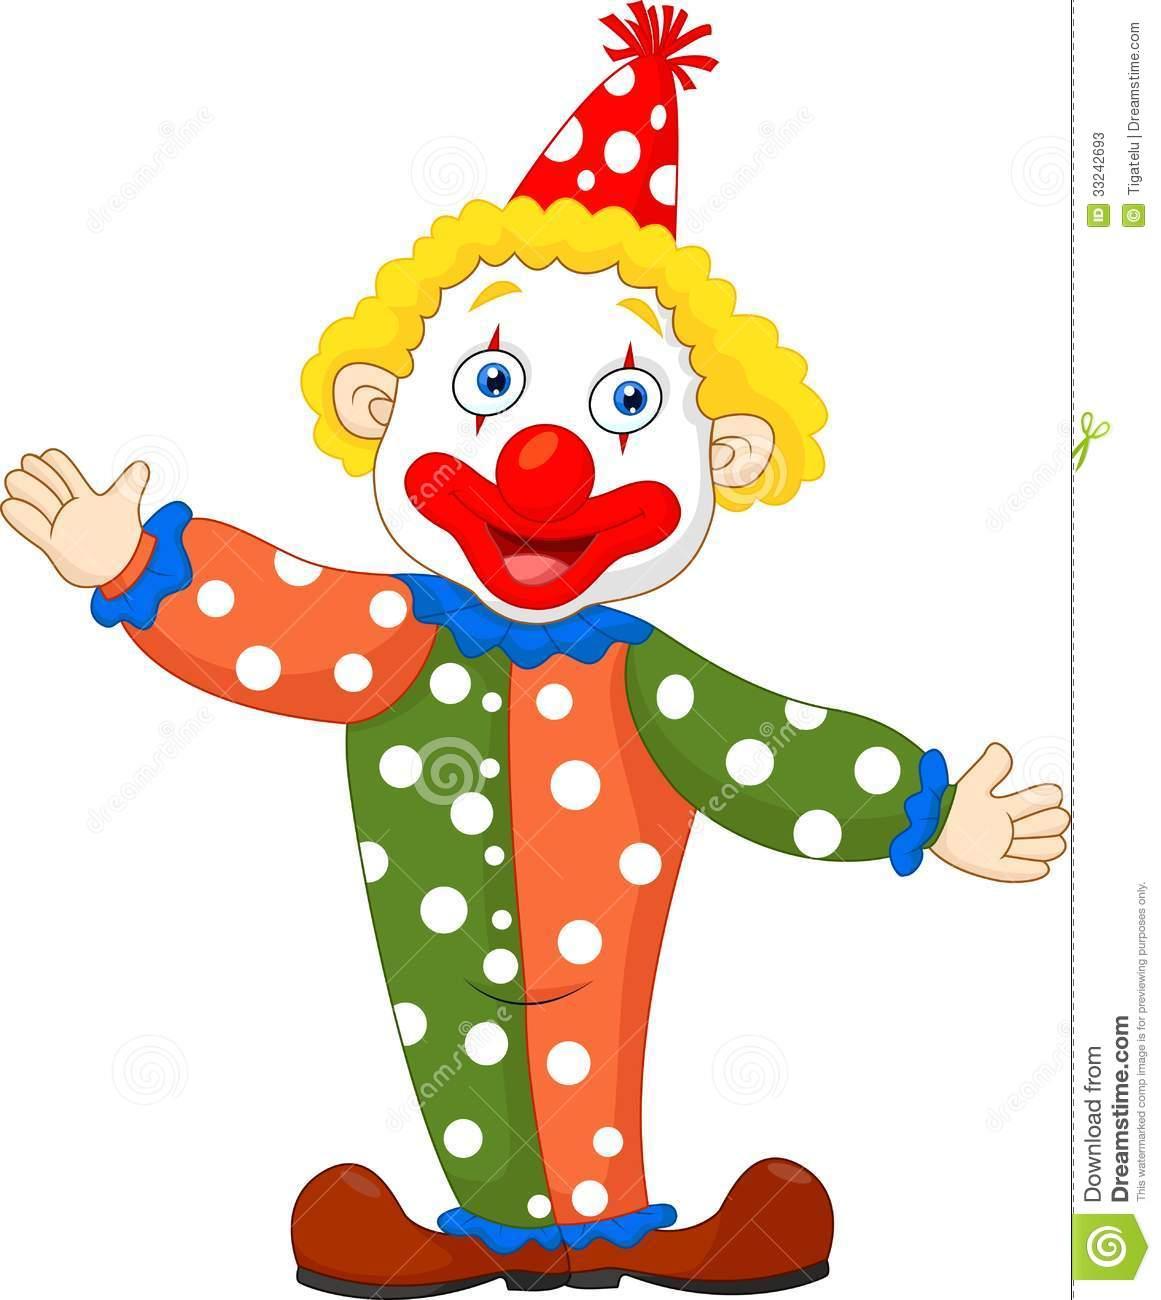 Circus joker clipart svg black and white Cartoon Clown Clipart - Clipart Kid svg black and white